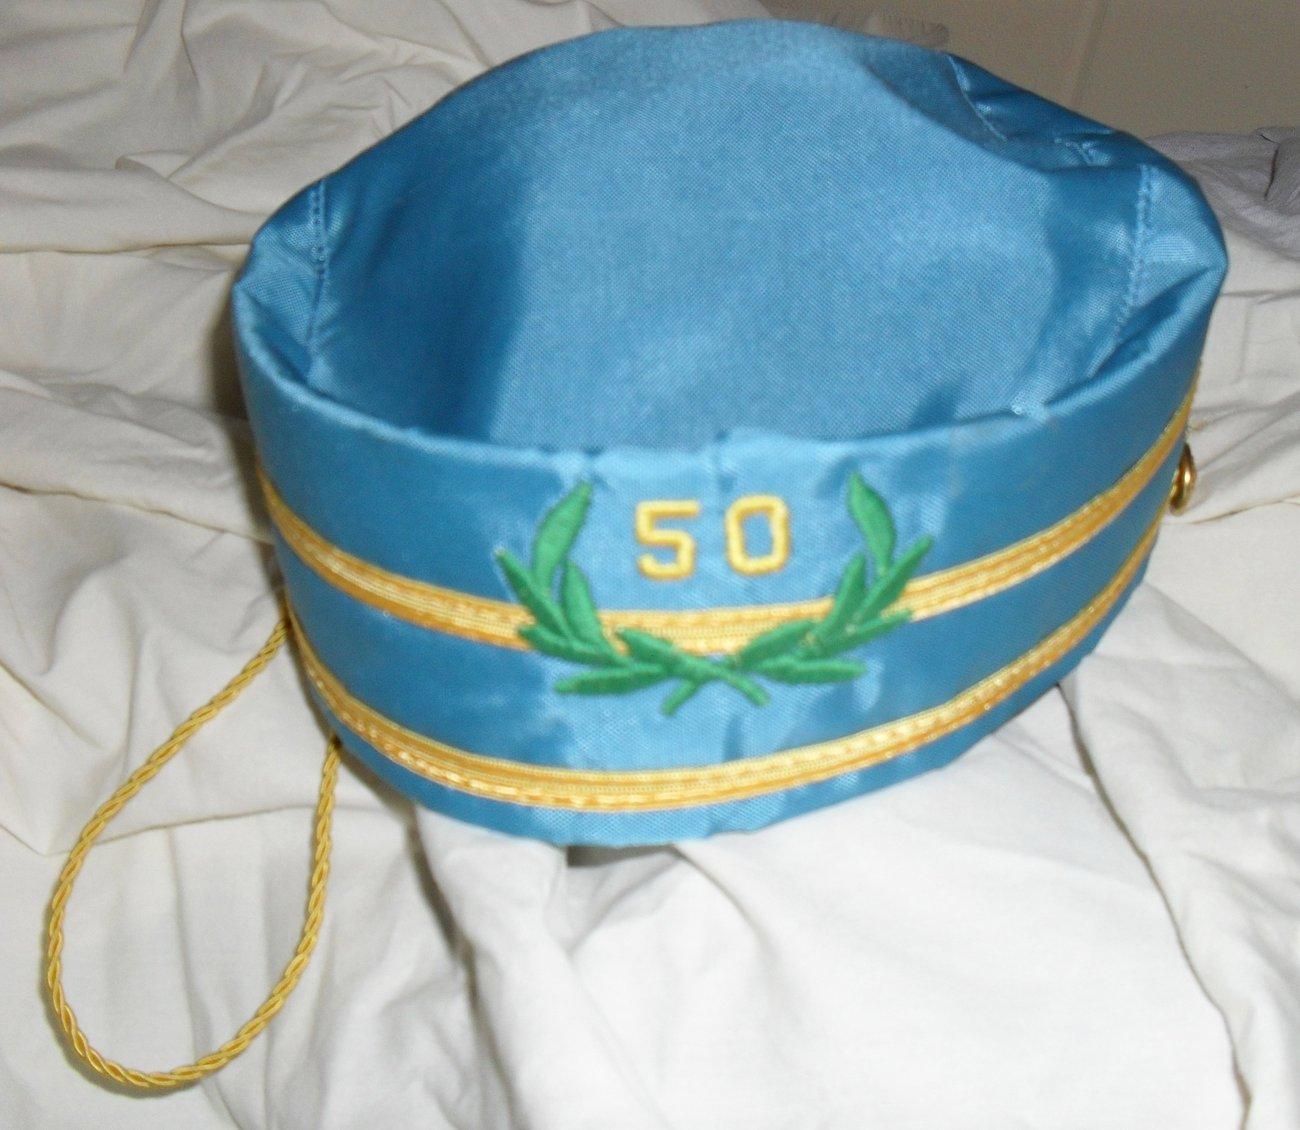 Sdc10550